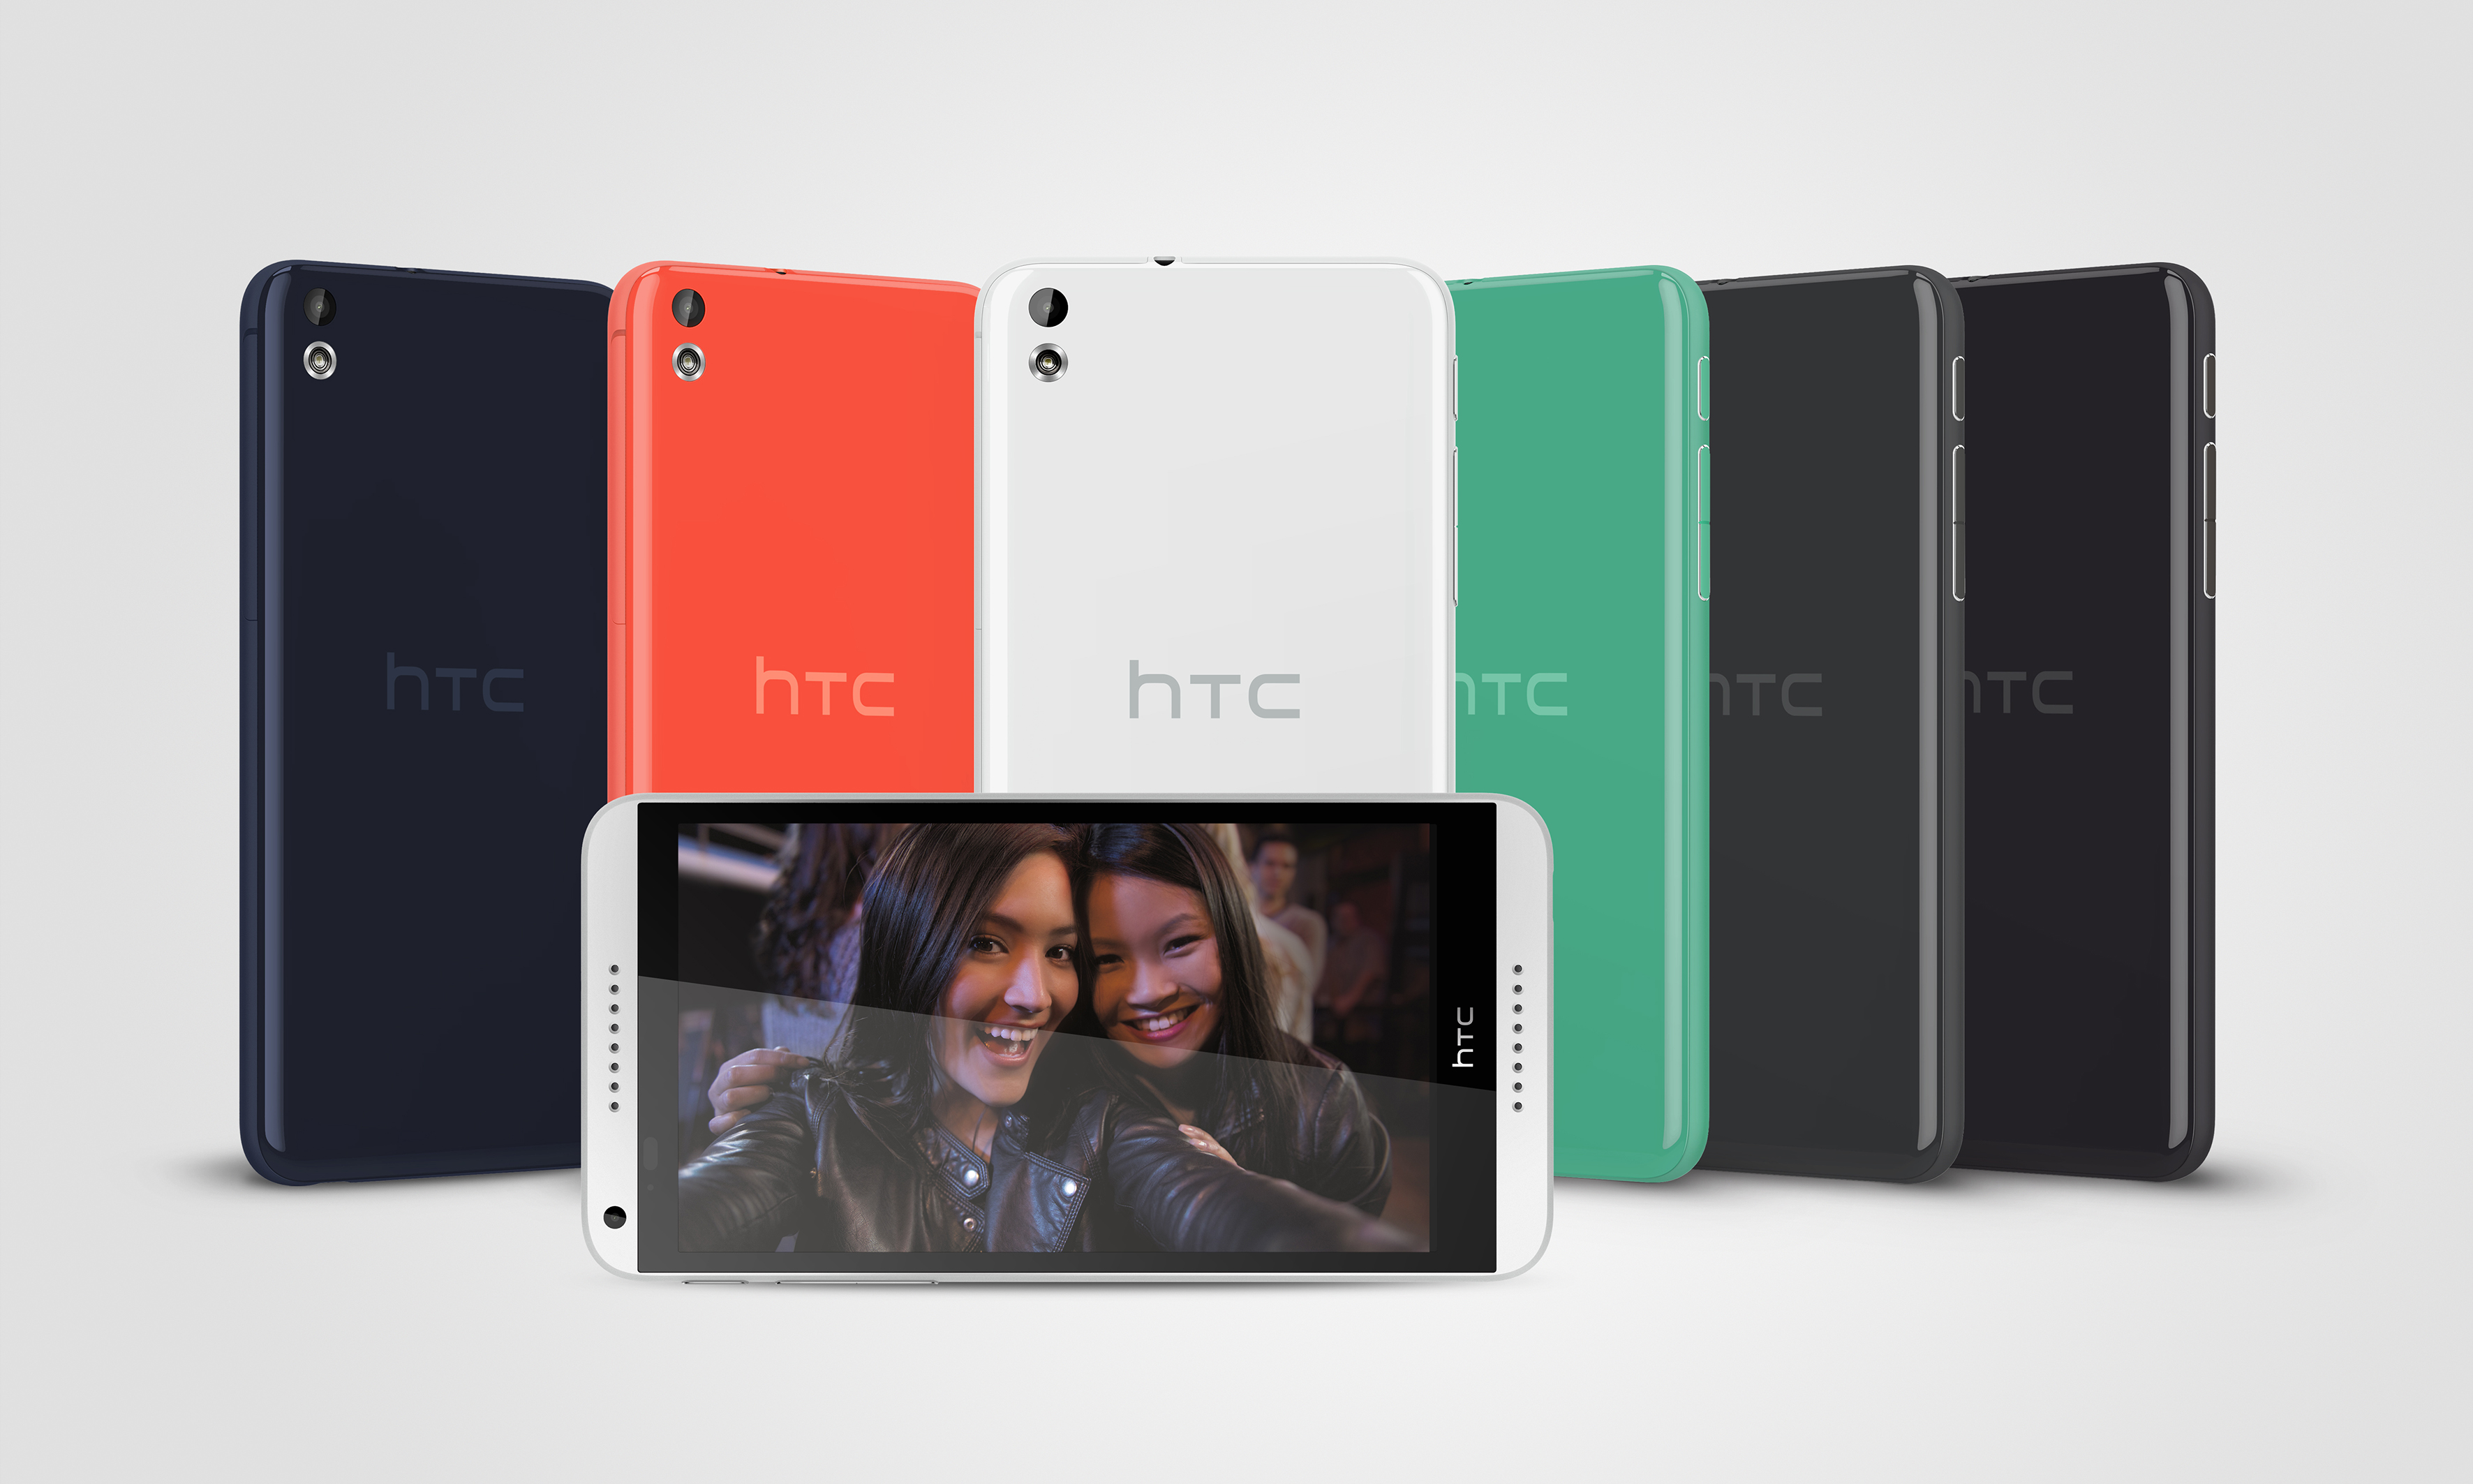 HTC-Desire-816-All-Colors